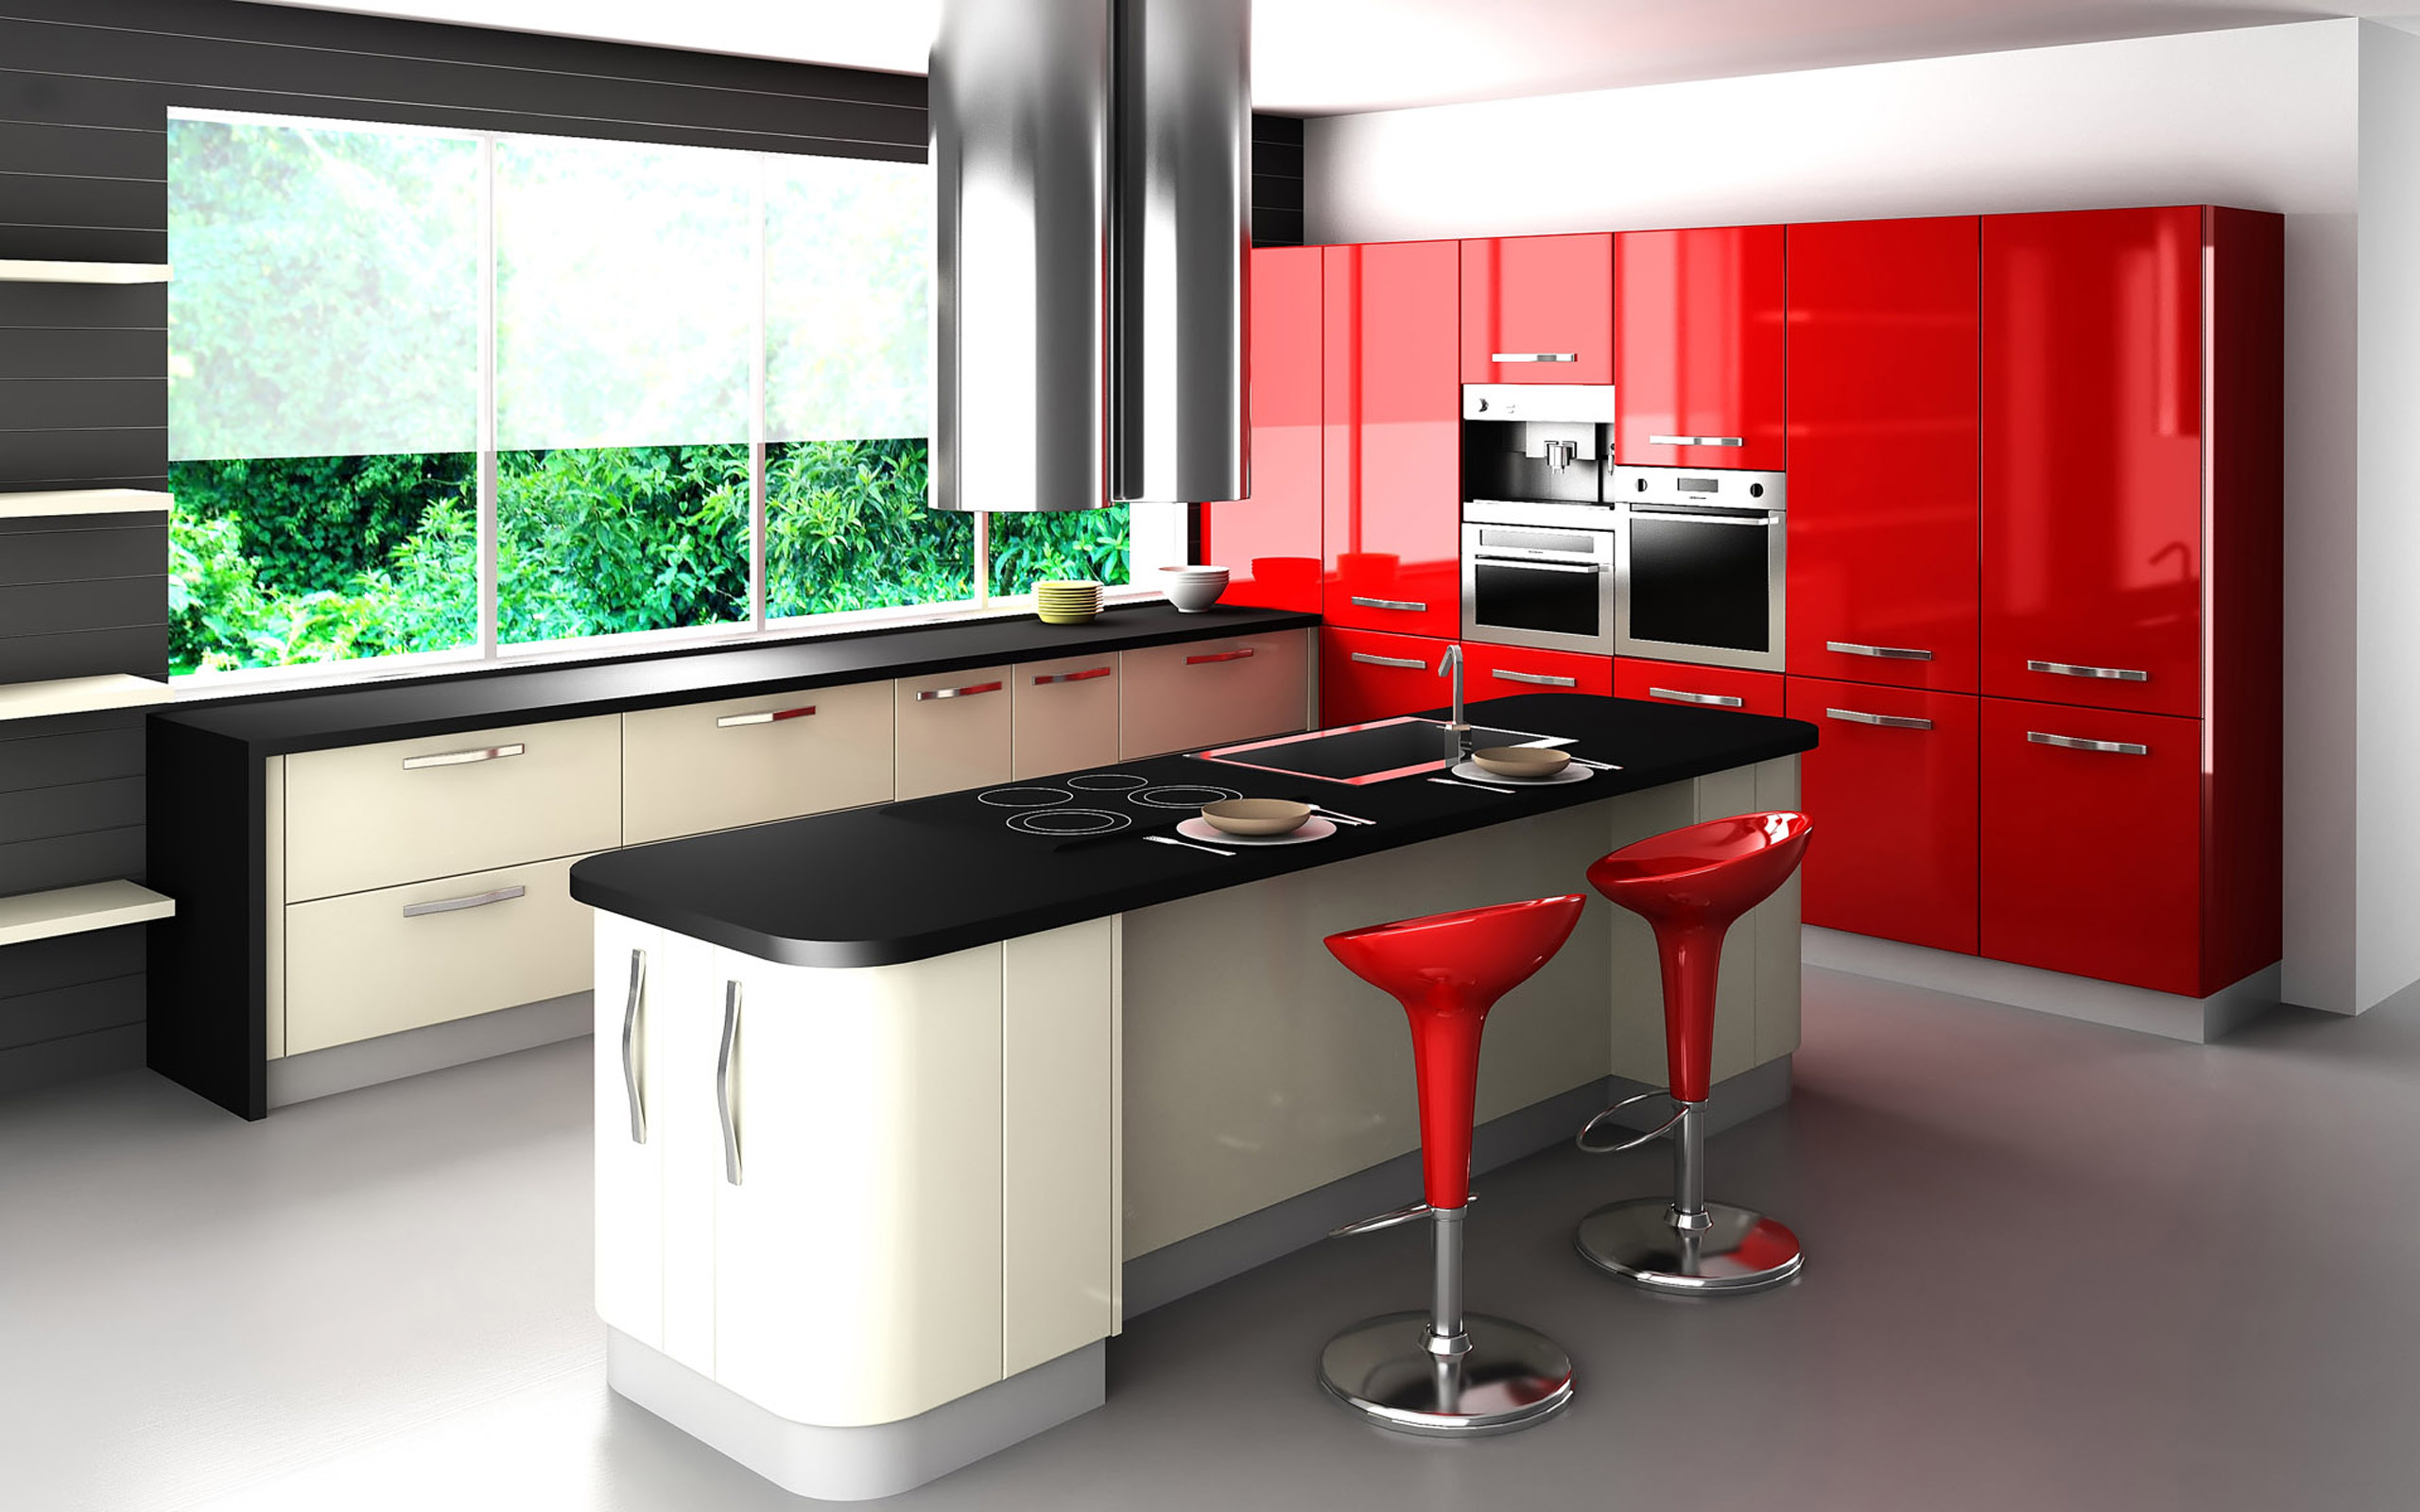 Black and Red Modern Kitchen photo - 4